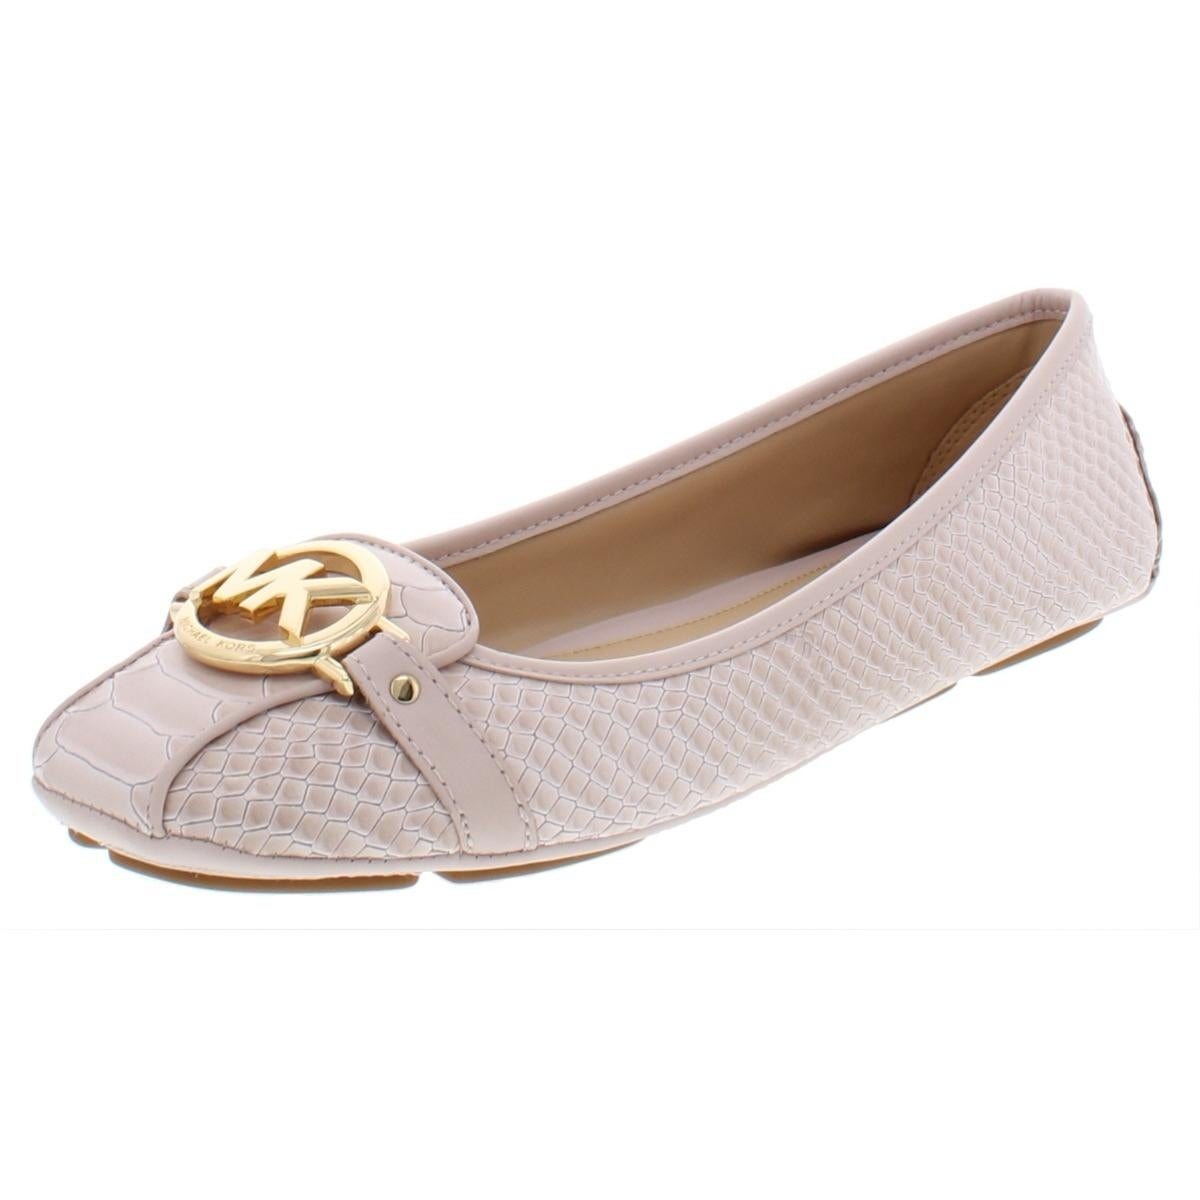 78657162a Shop MICHAEL Michael Kors Womens Fulton Moc Ballet Flats Embossed ...